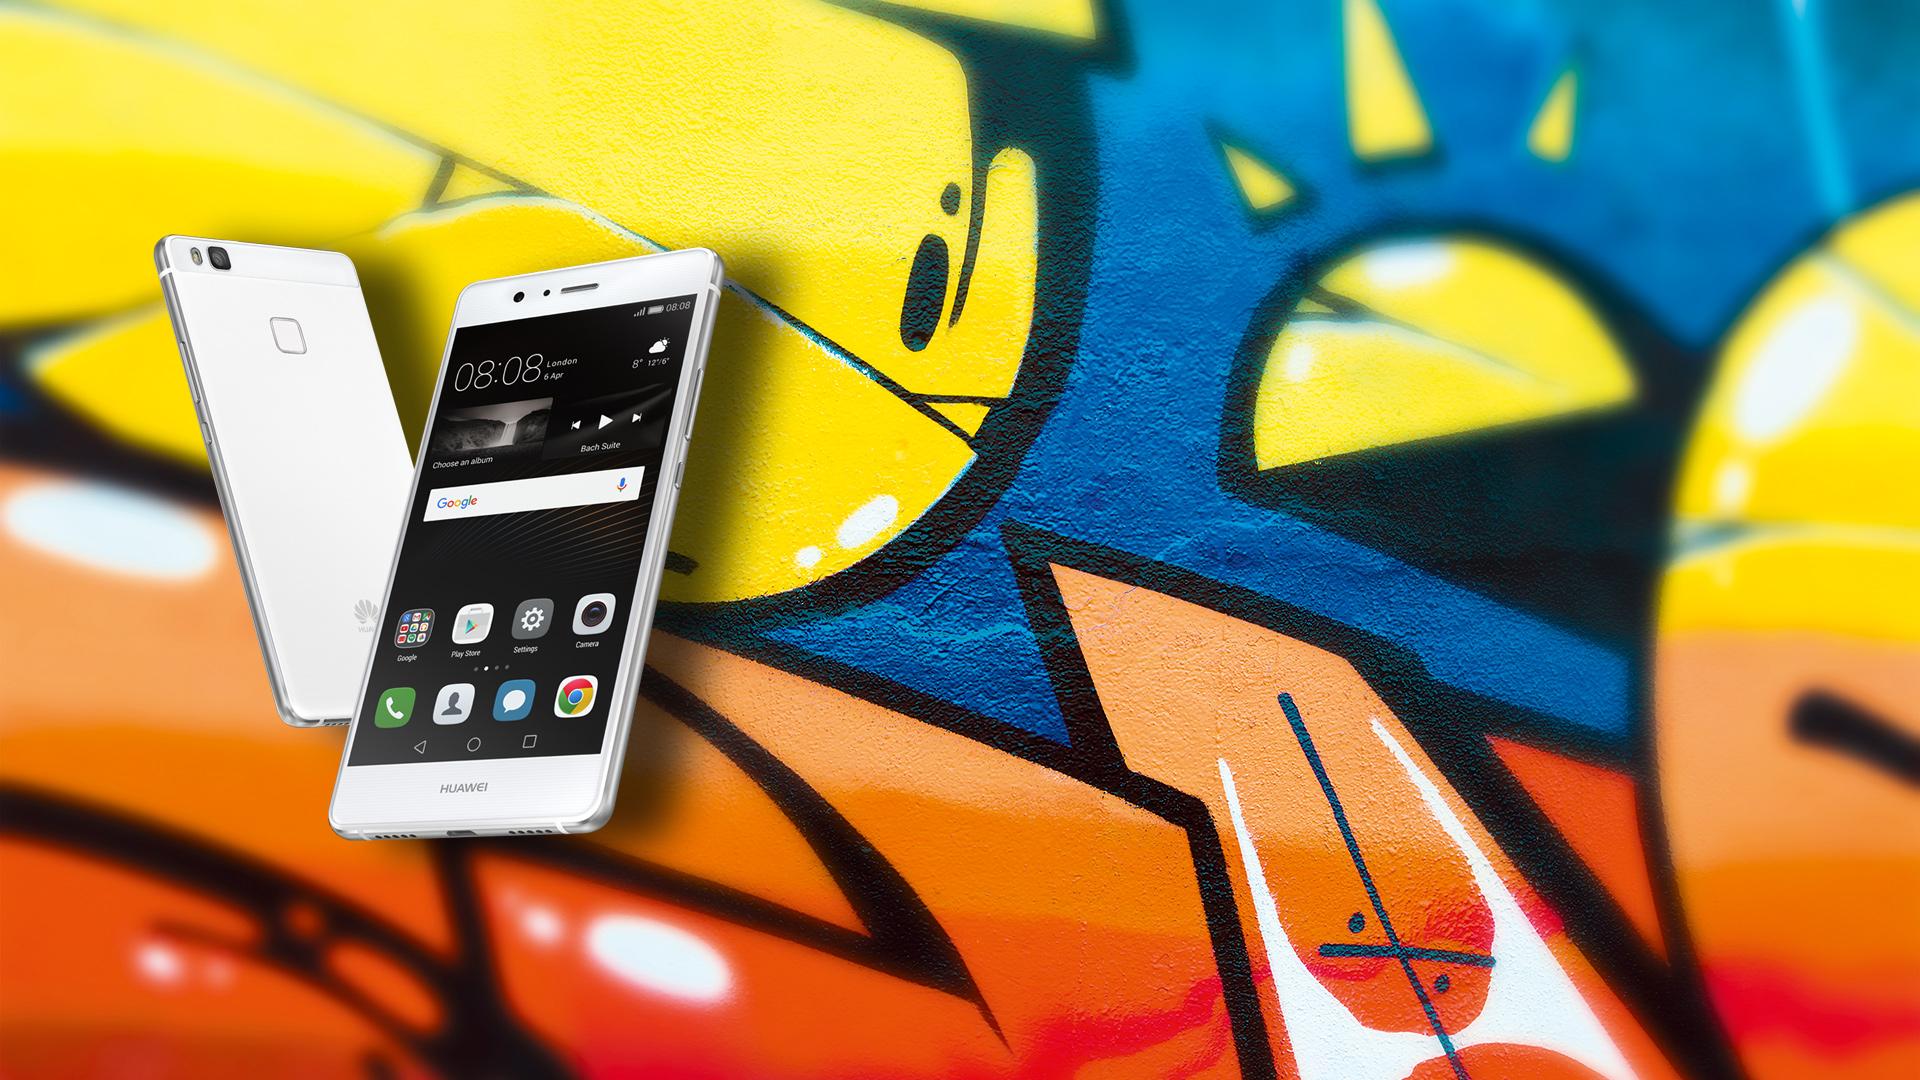 Huawei P9 Lite vor Graffiti-Wand